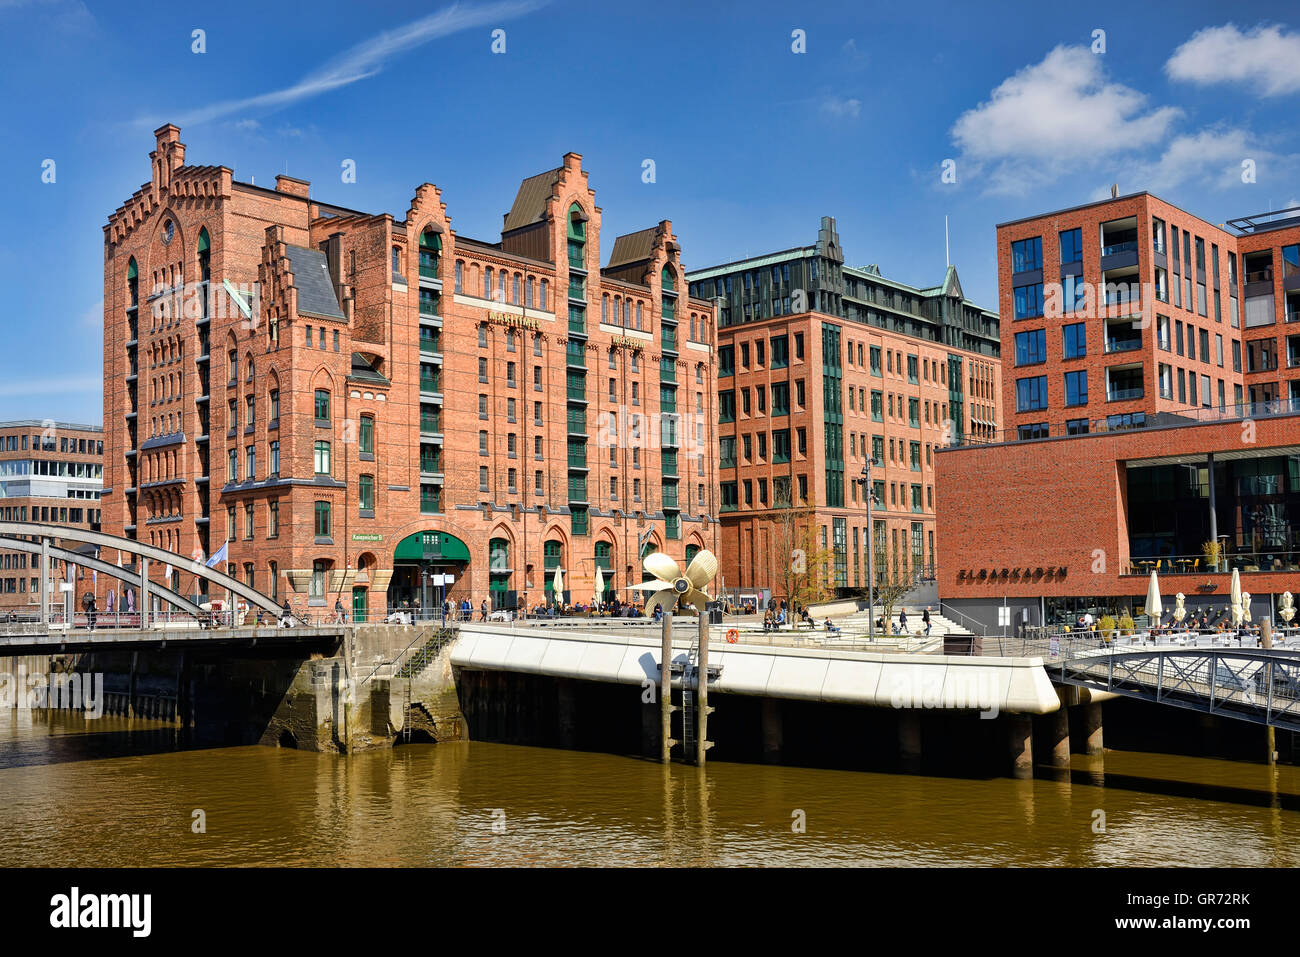 International Maritime Museum In Hamburg, Germany - Stock Image